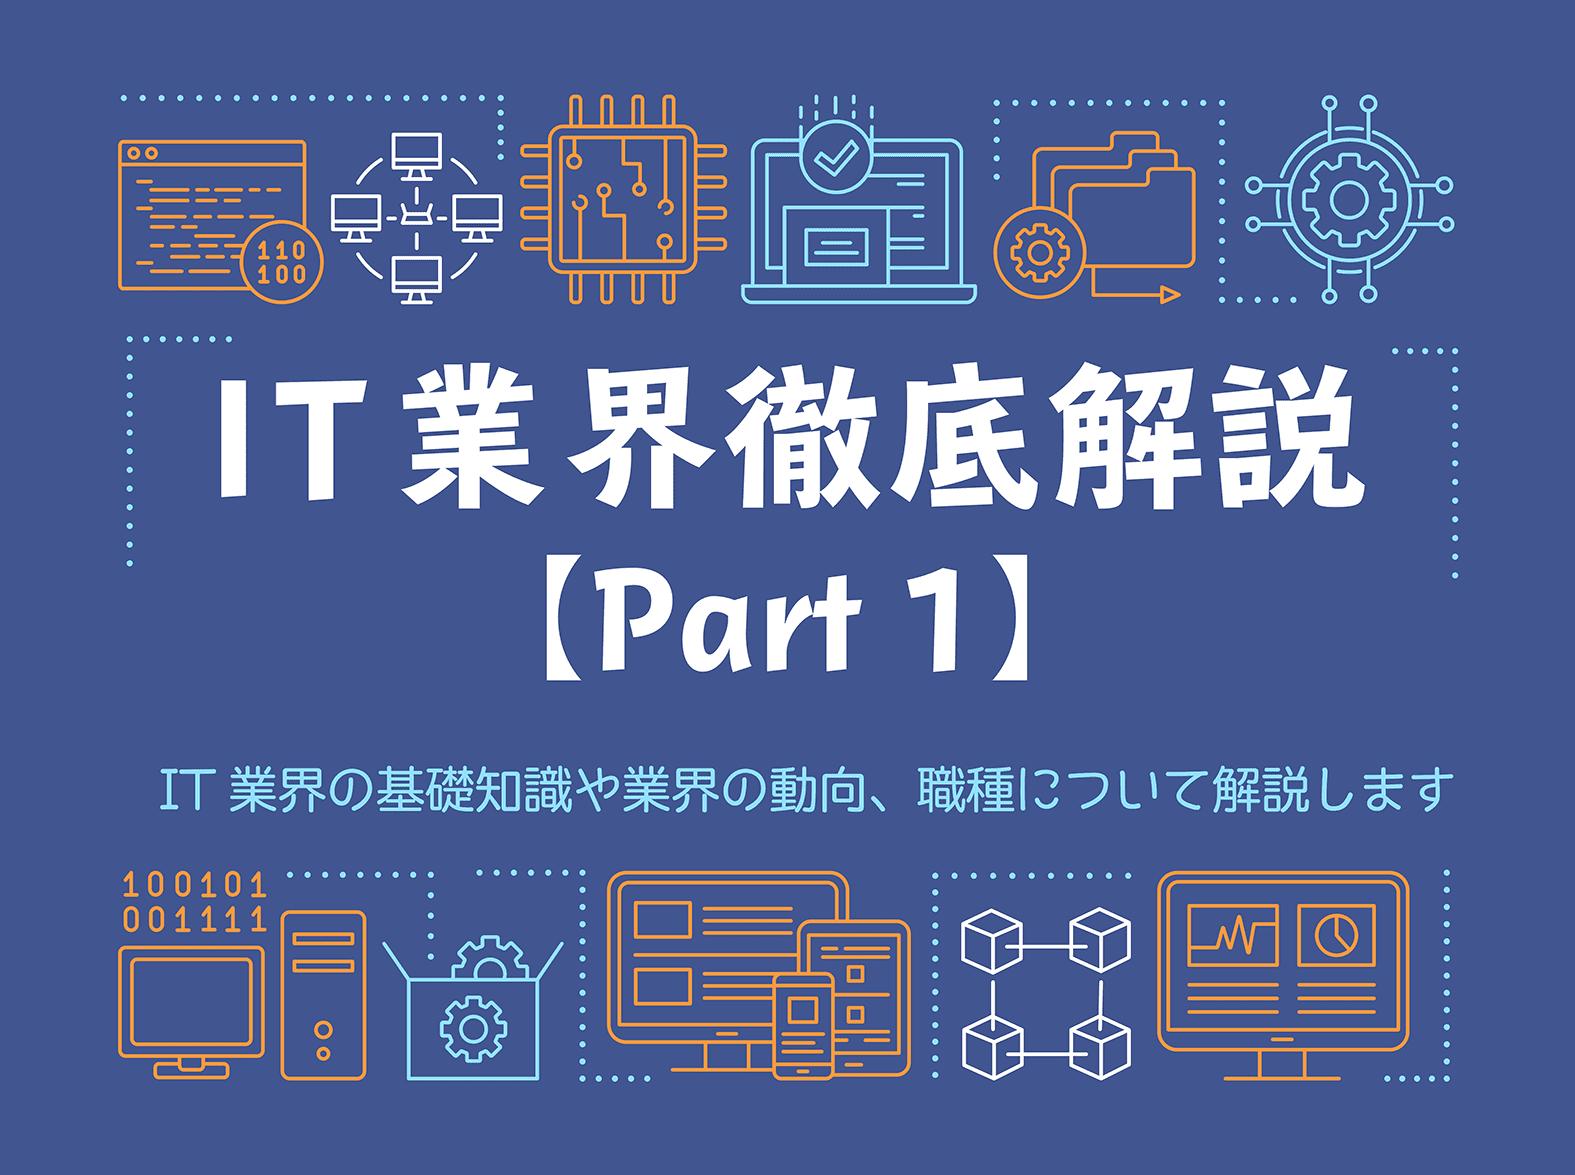 【IT業界徹底解説Part1】IT業界で働くための基礎知識